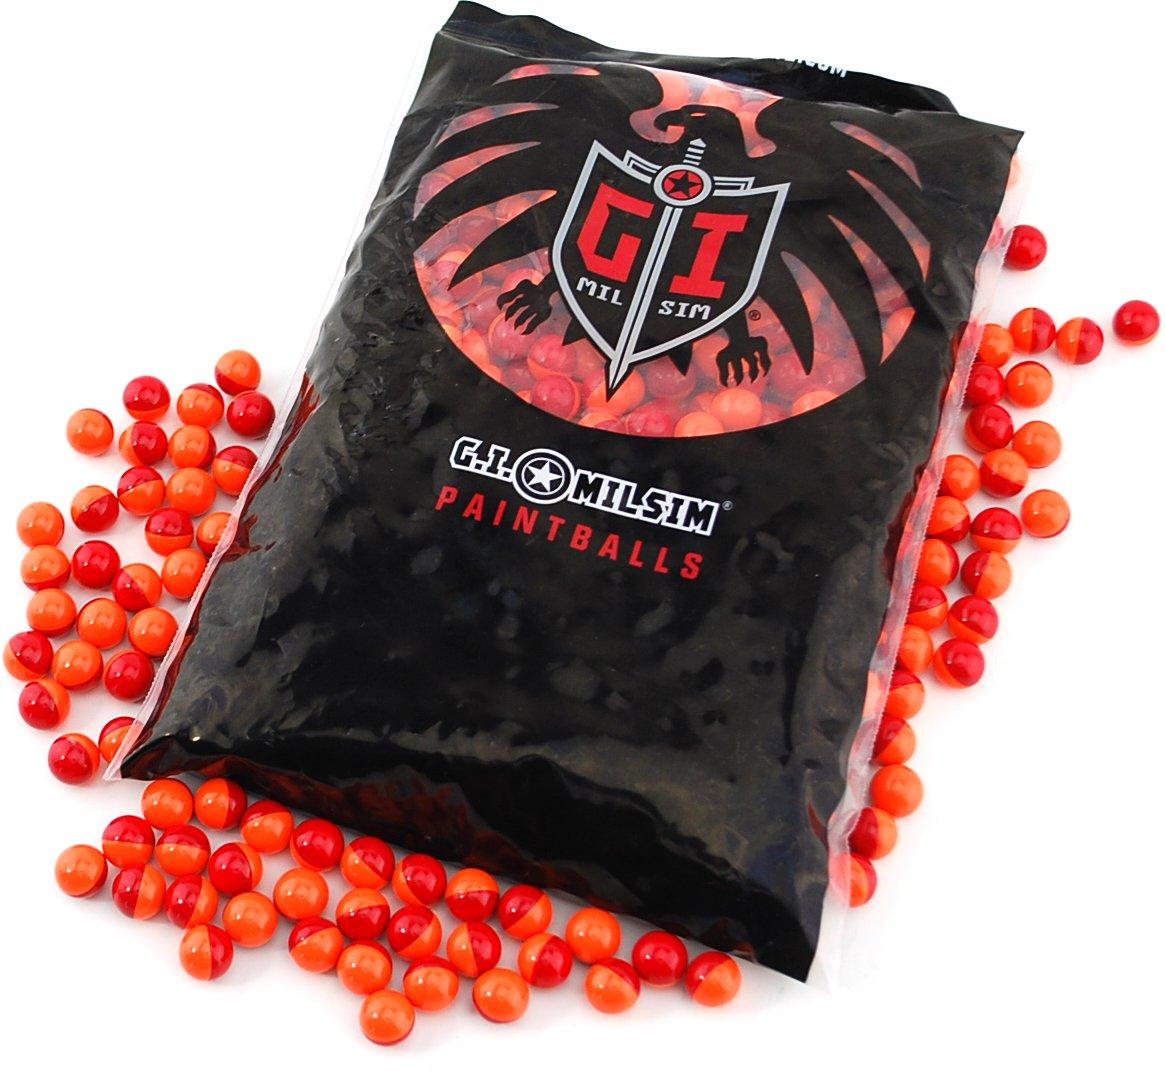 JT GI Splatmaster .50 Cal Biodegradable Low Impact Non-Toxic Paintball Ammo -.